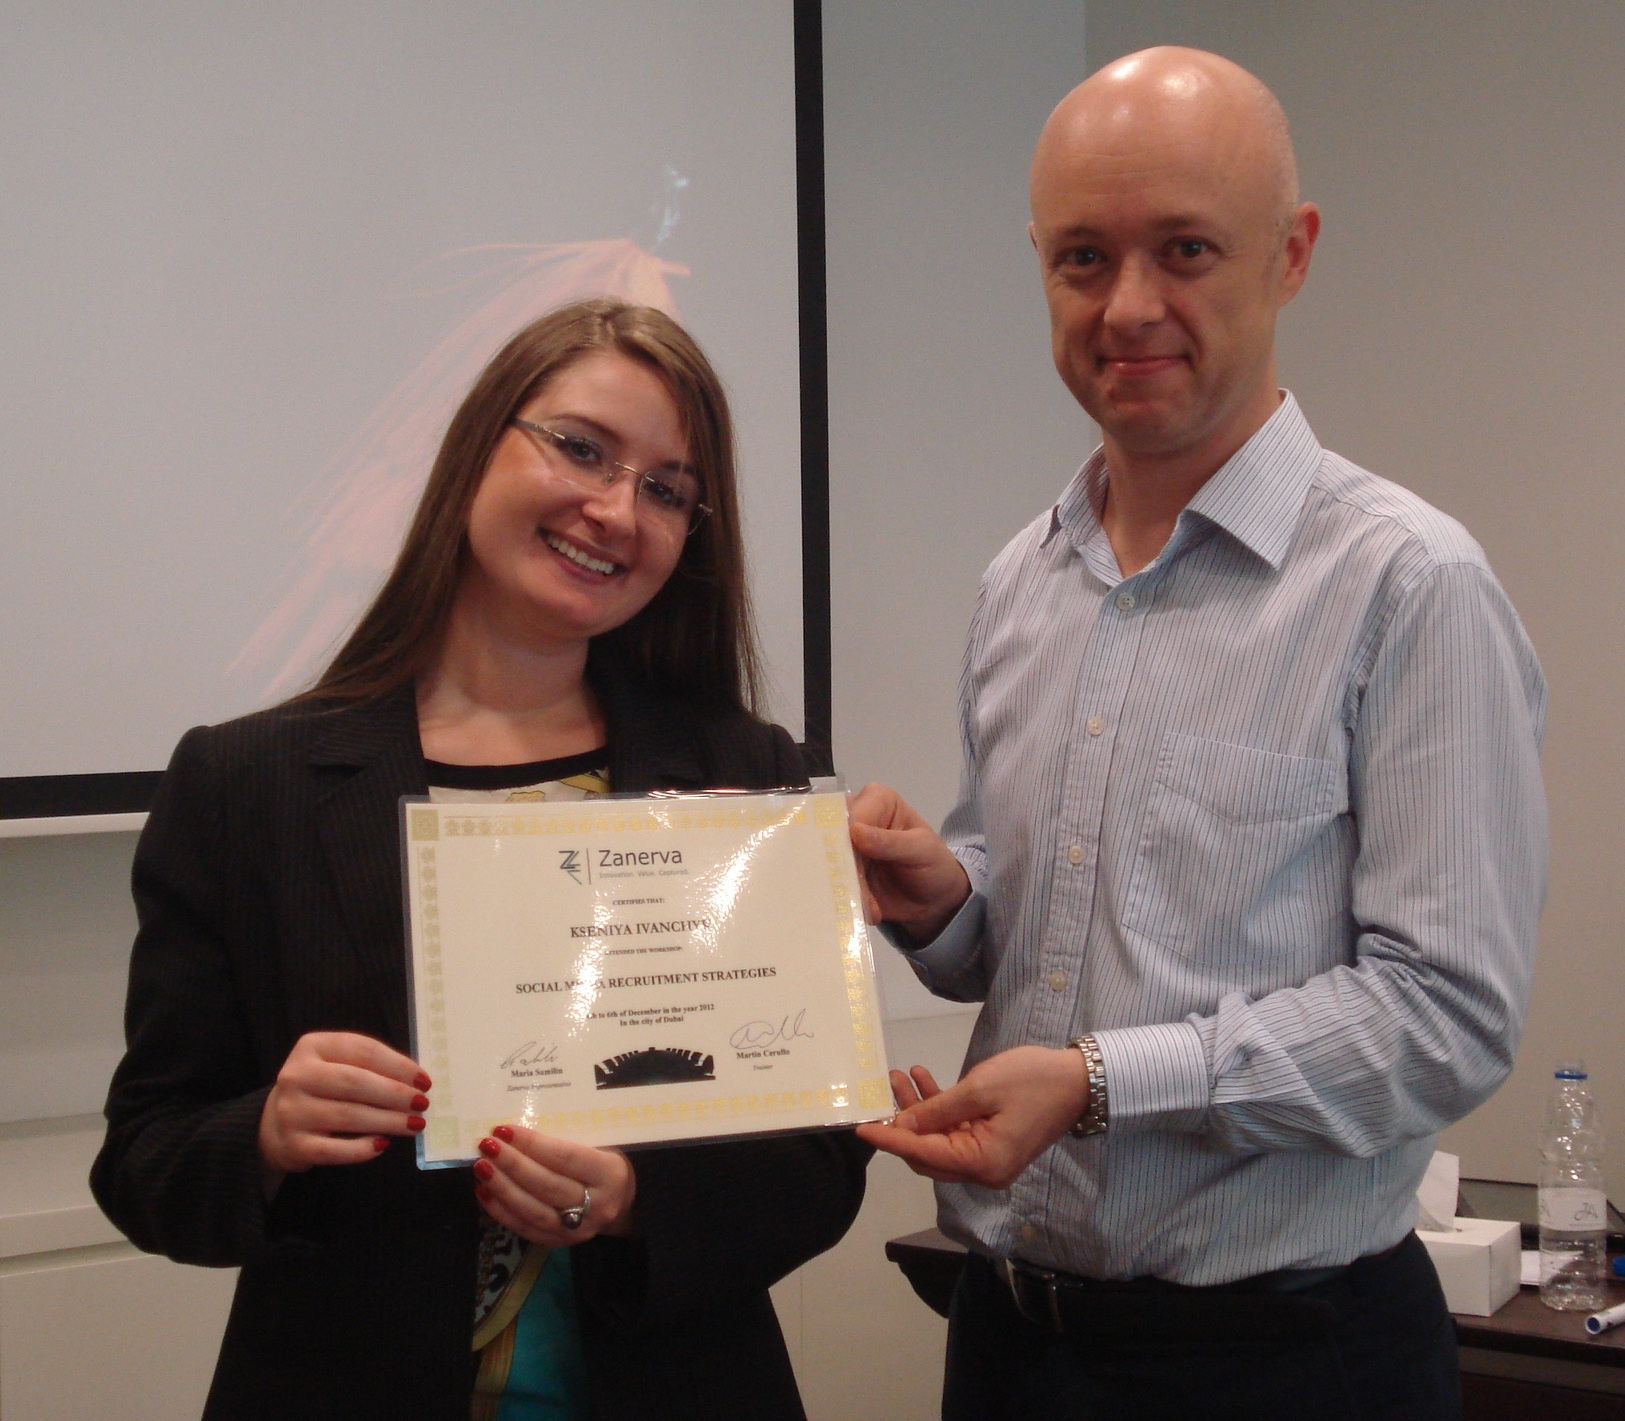 KseniyaIvanchykreceiving her certificate of workshop participation from Martin Cerullo for attending the Social Media Recruitment in Dubai